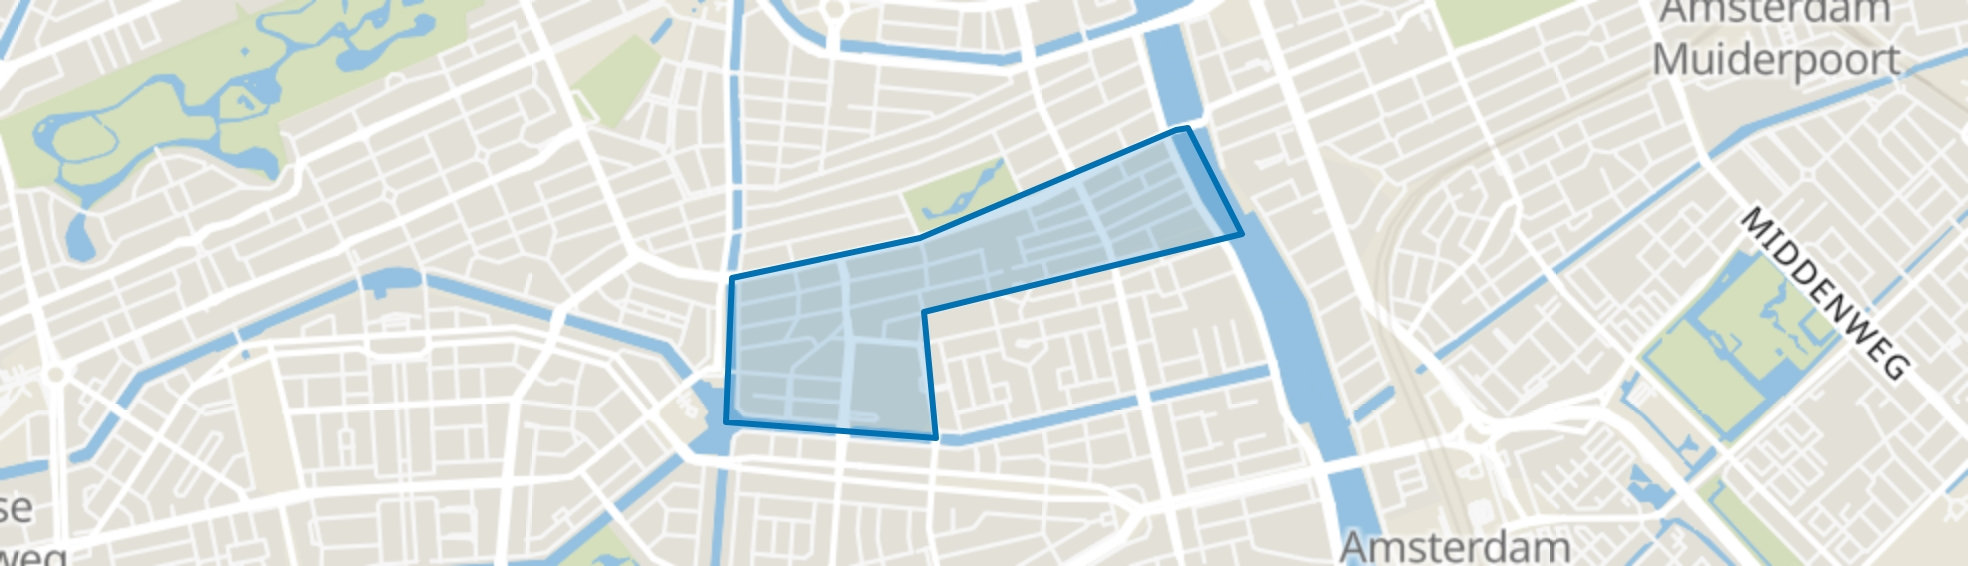 Nieuwe Pijp, Amsterdam map